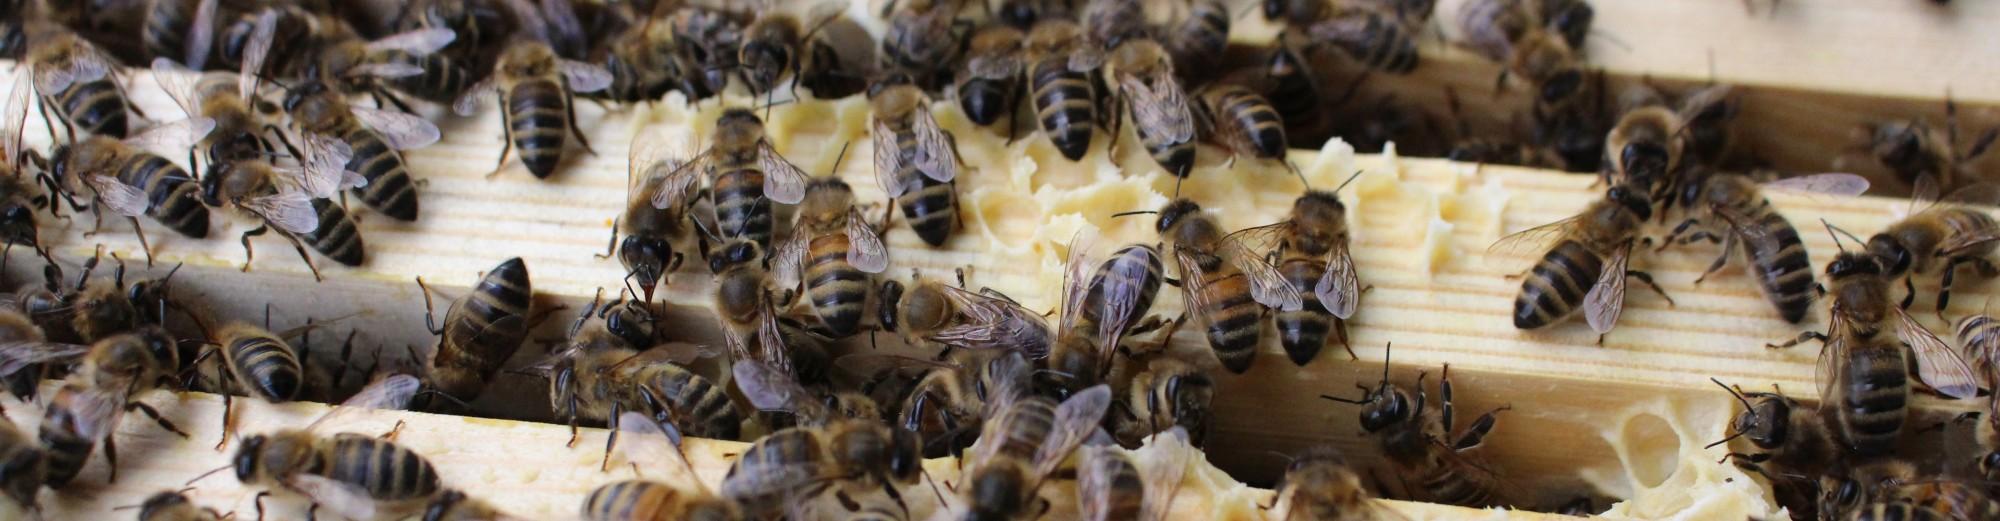 East Lancashire Beekeepers Association